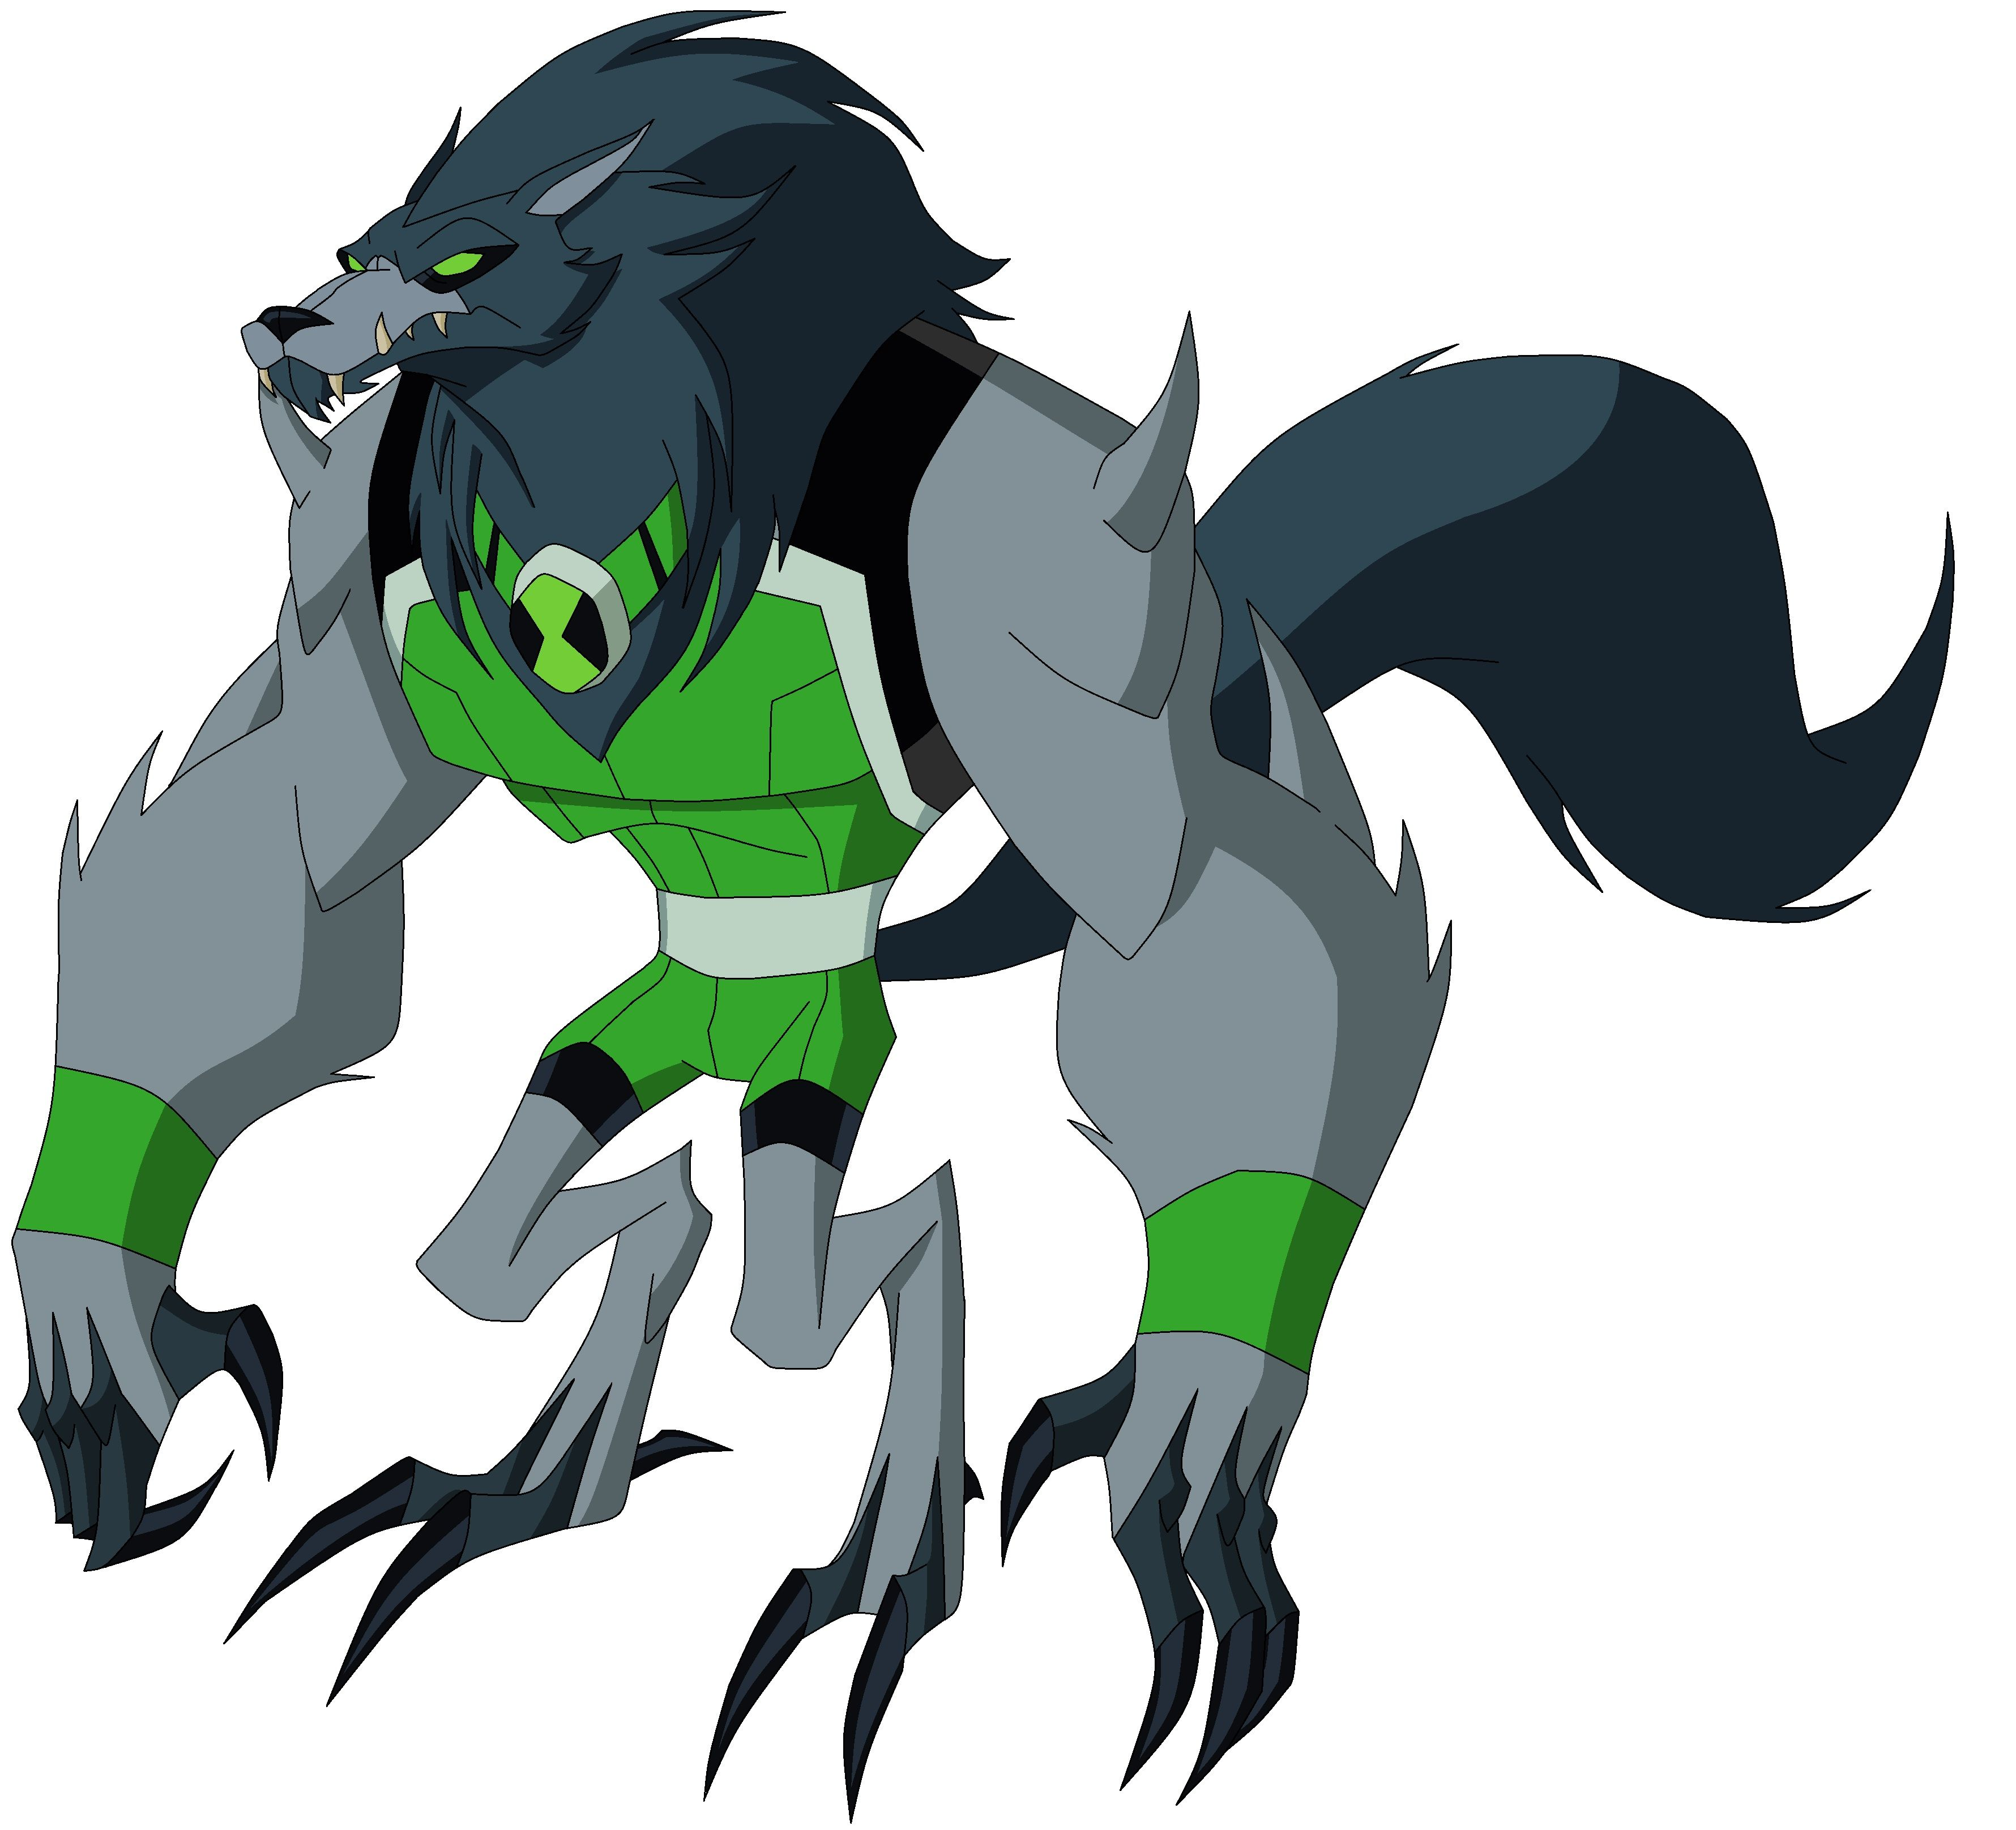 Ben 10 omniverse ben wolf google search tayshawns ben 10 ben 10 omniverse ben wolf google search voltagebd Choice Image